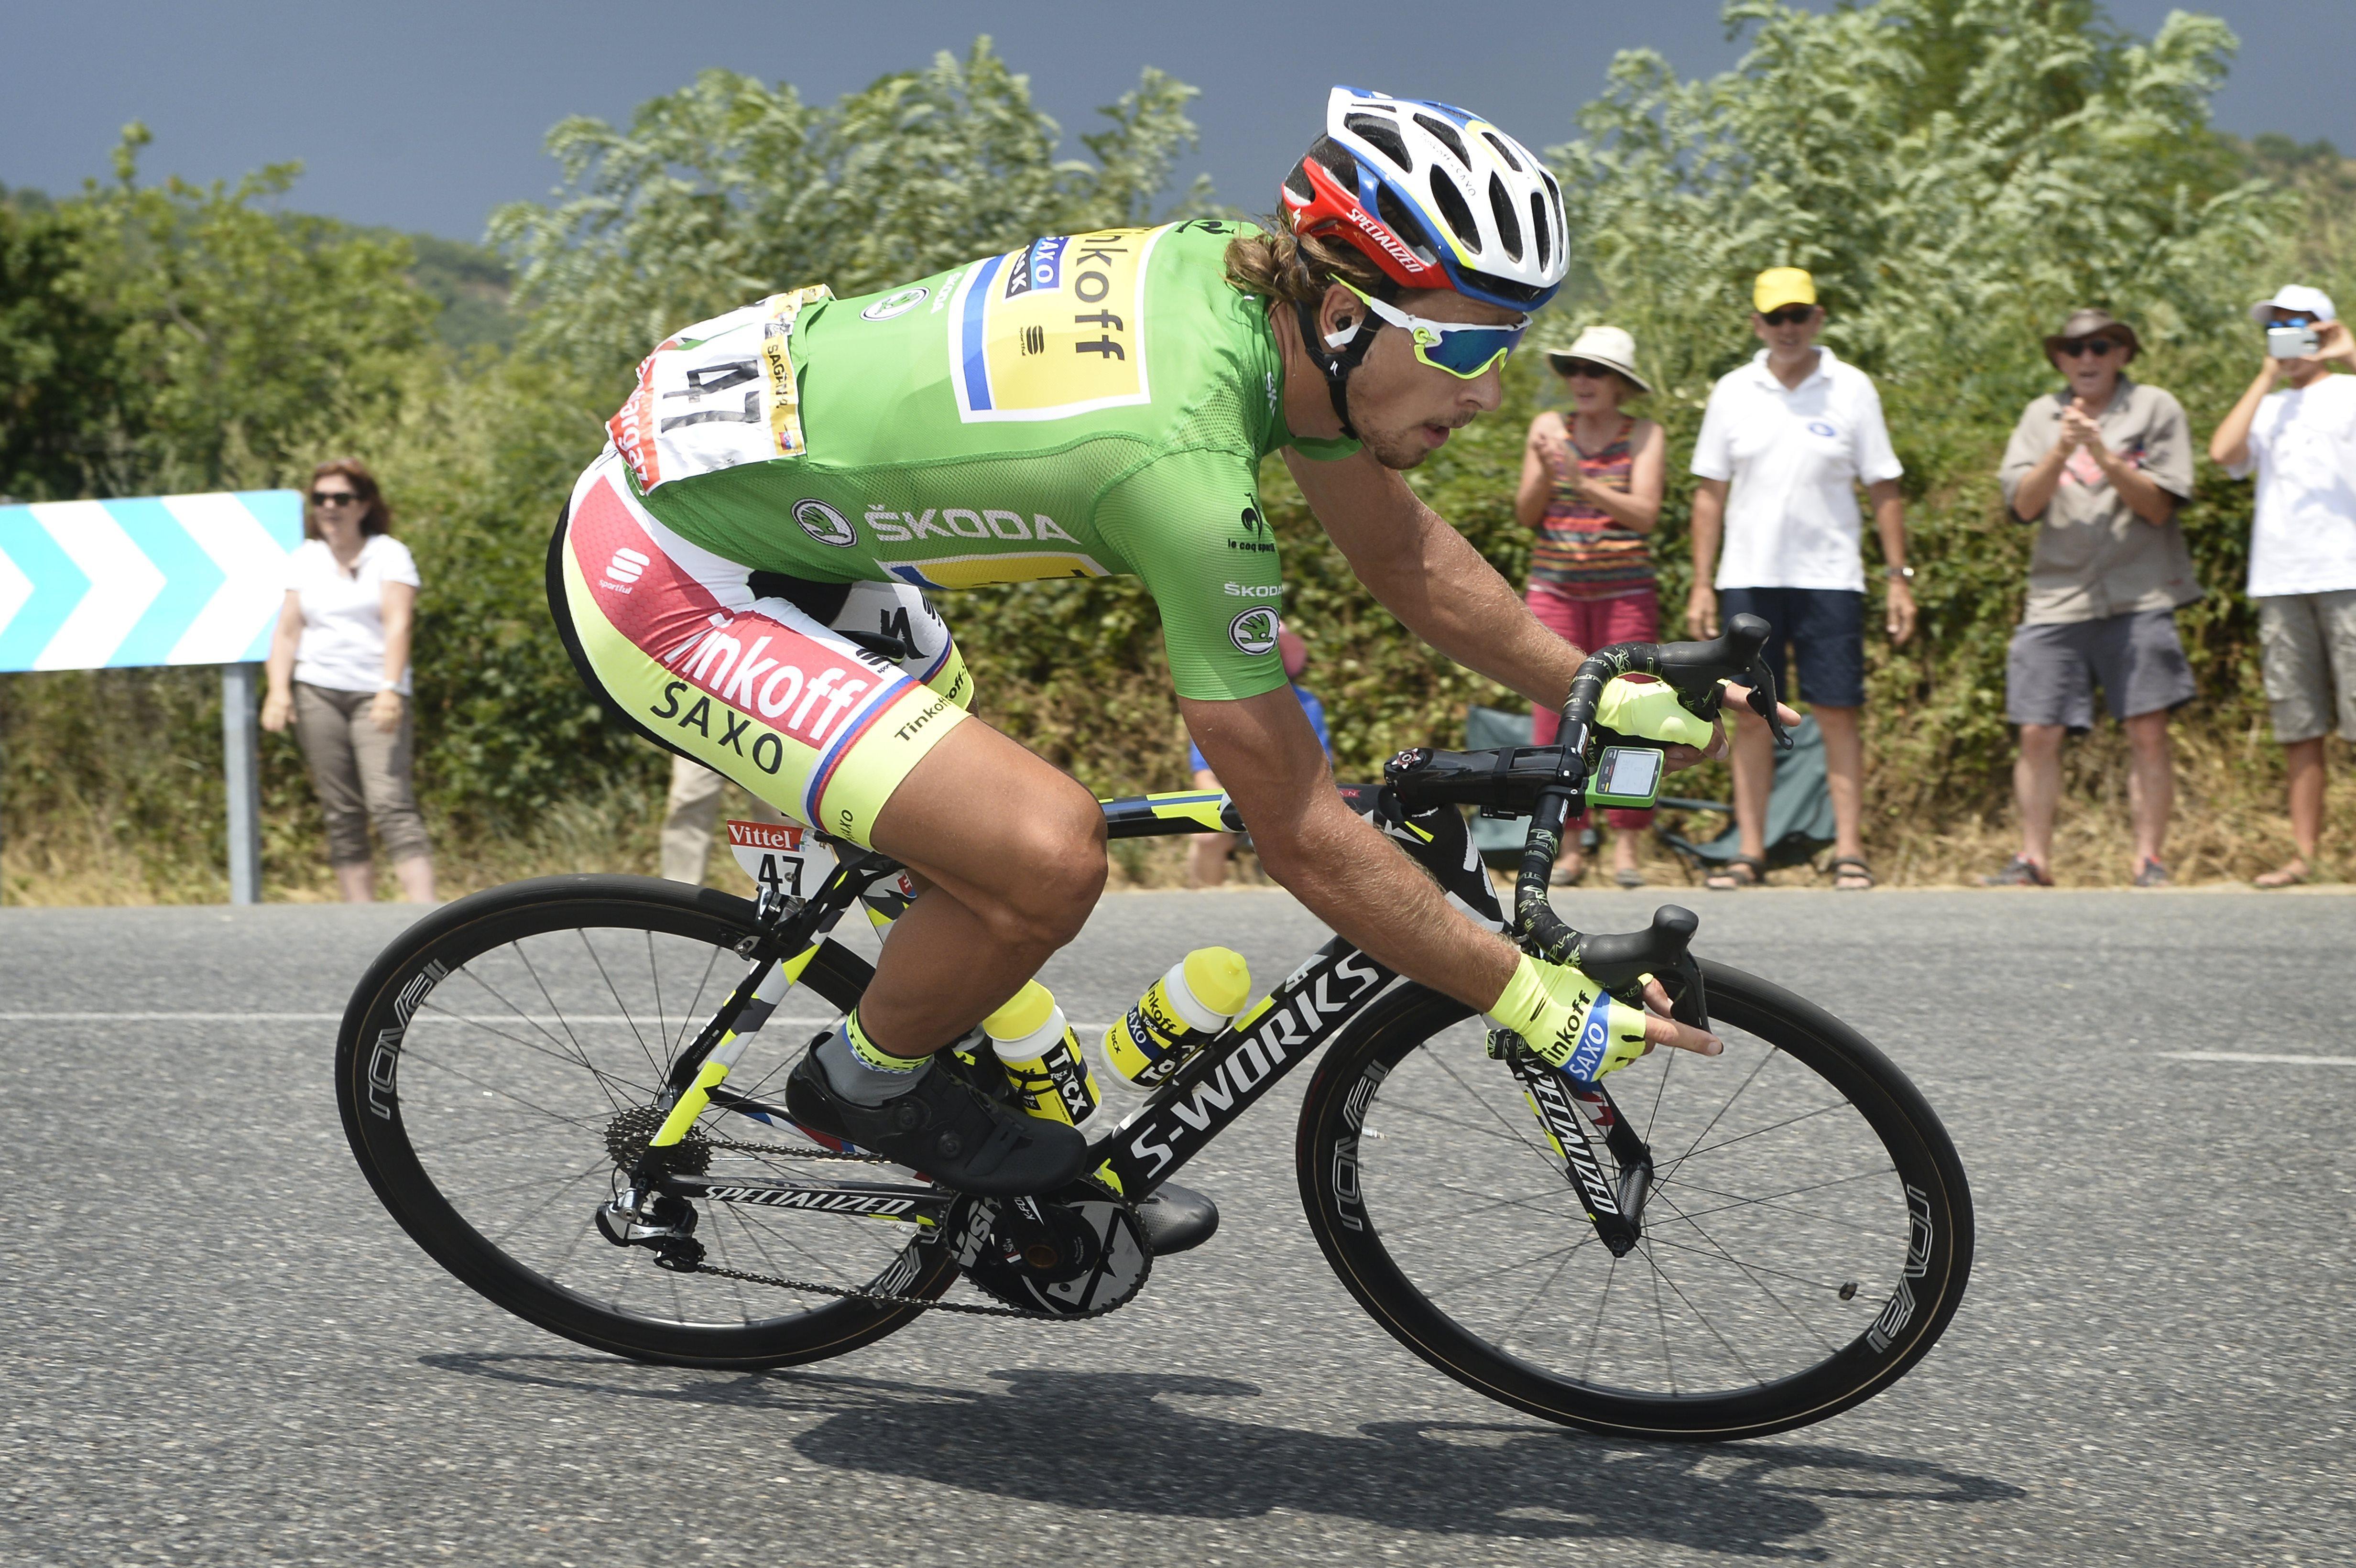 99fcb43d4 Watch: Peter Sagan's amazing descent of the Col de Manse - Cycling ...